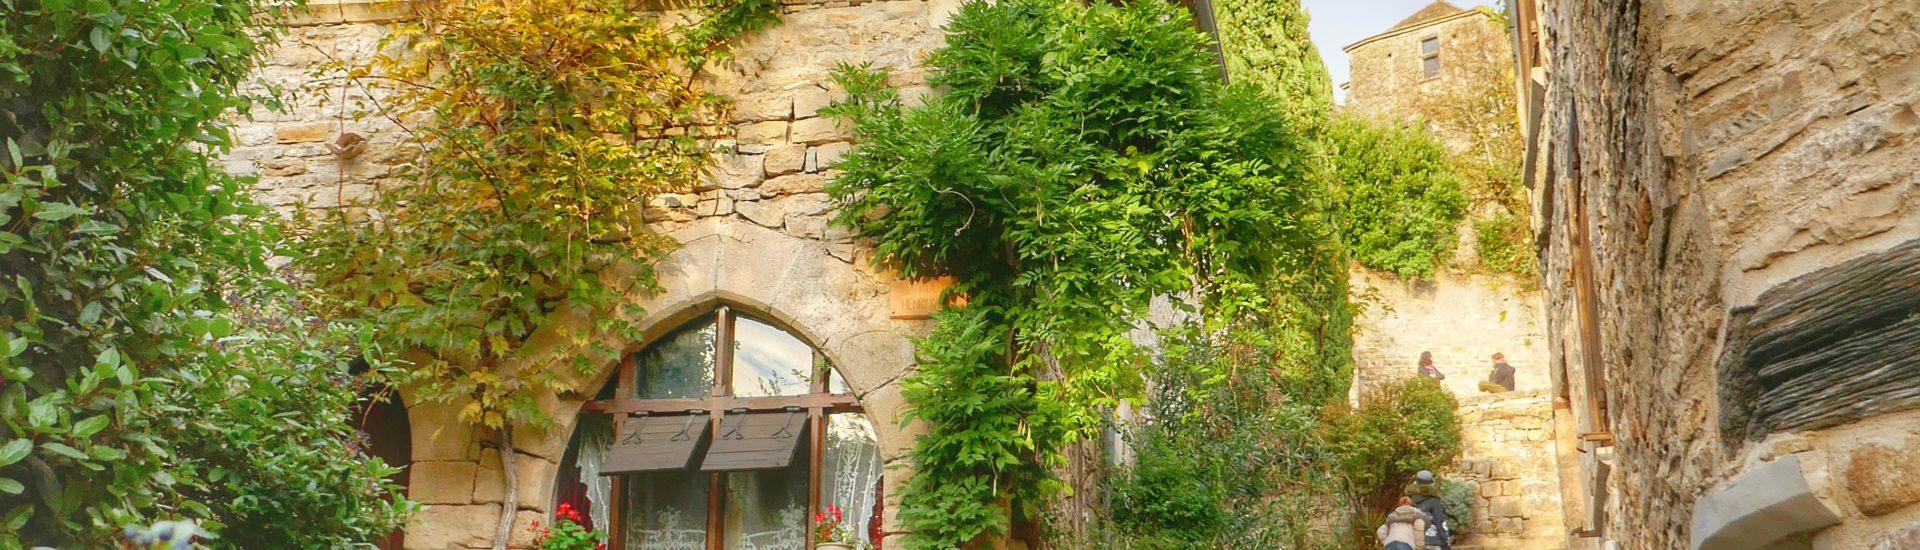 Le Tarn et Garonne en famille blog voyage